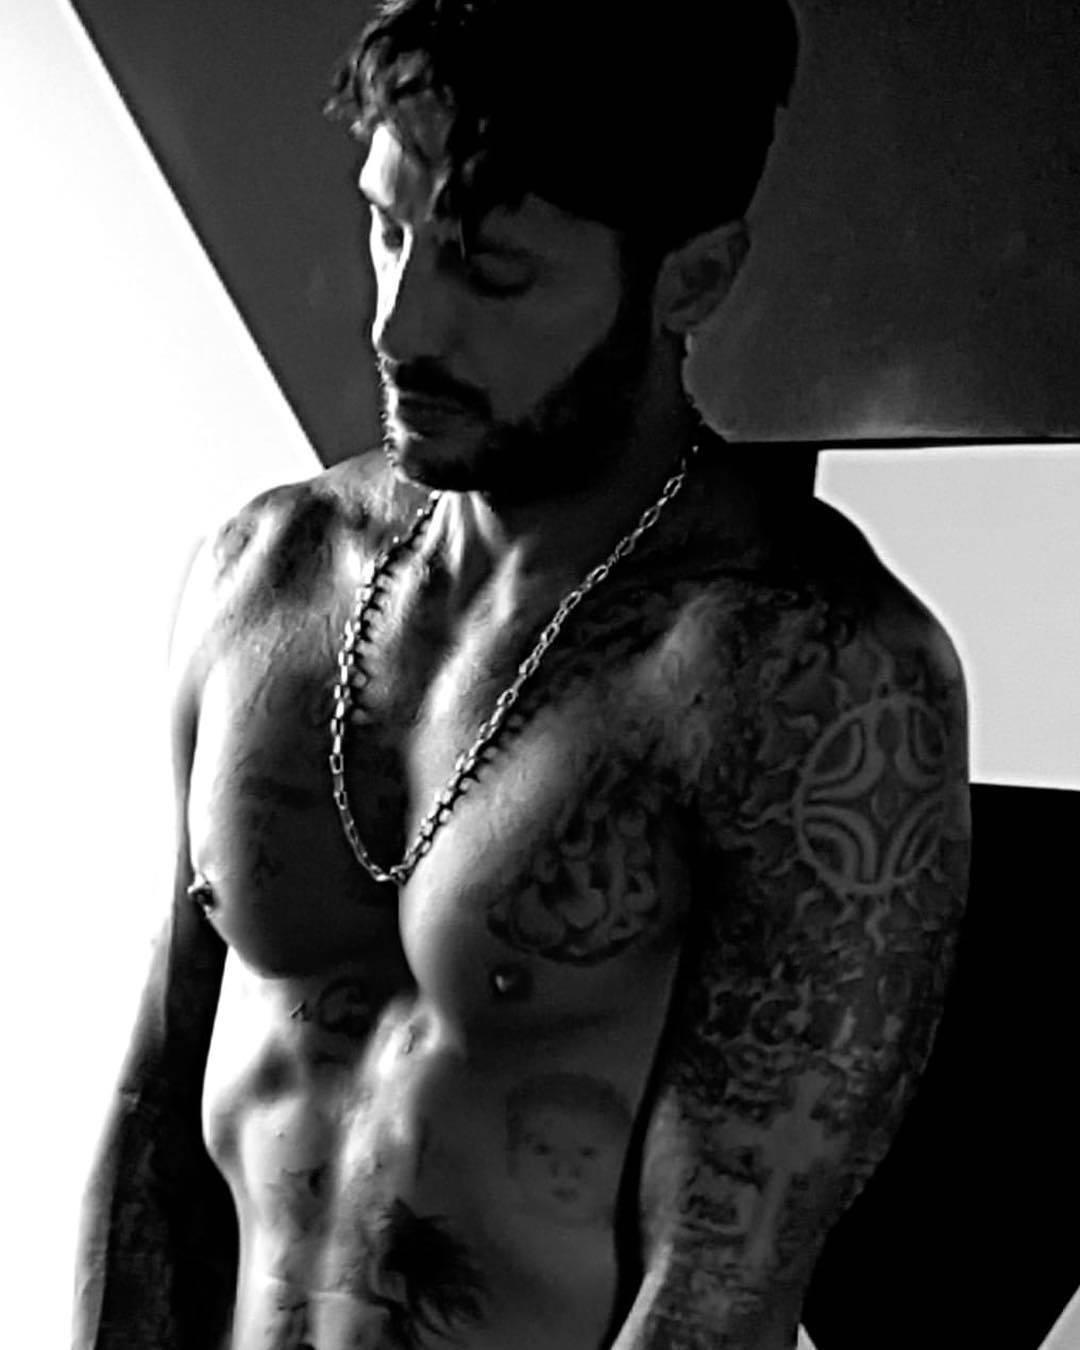 tattoo figlio photocredit @fabriziocoronareal